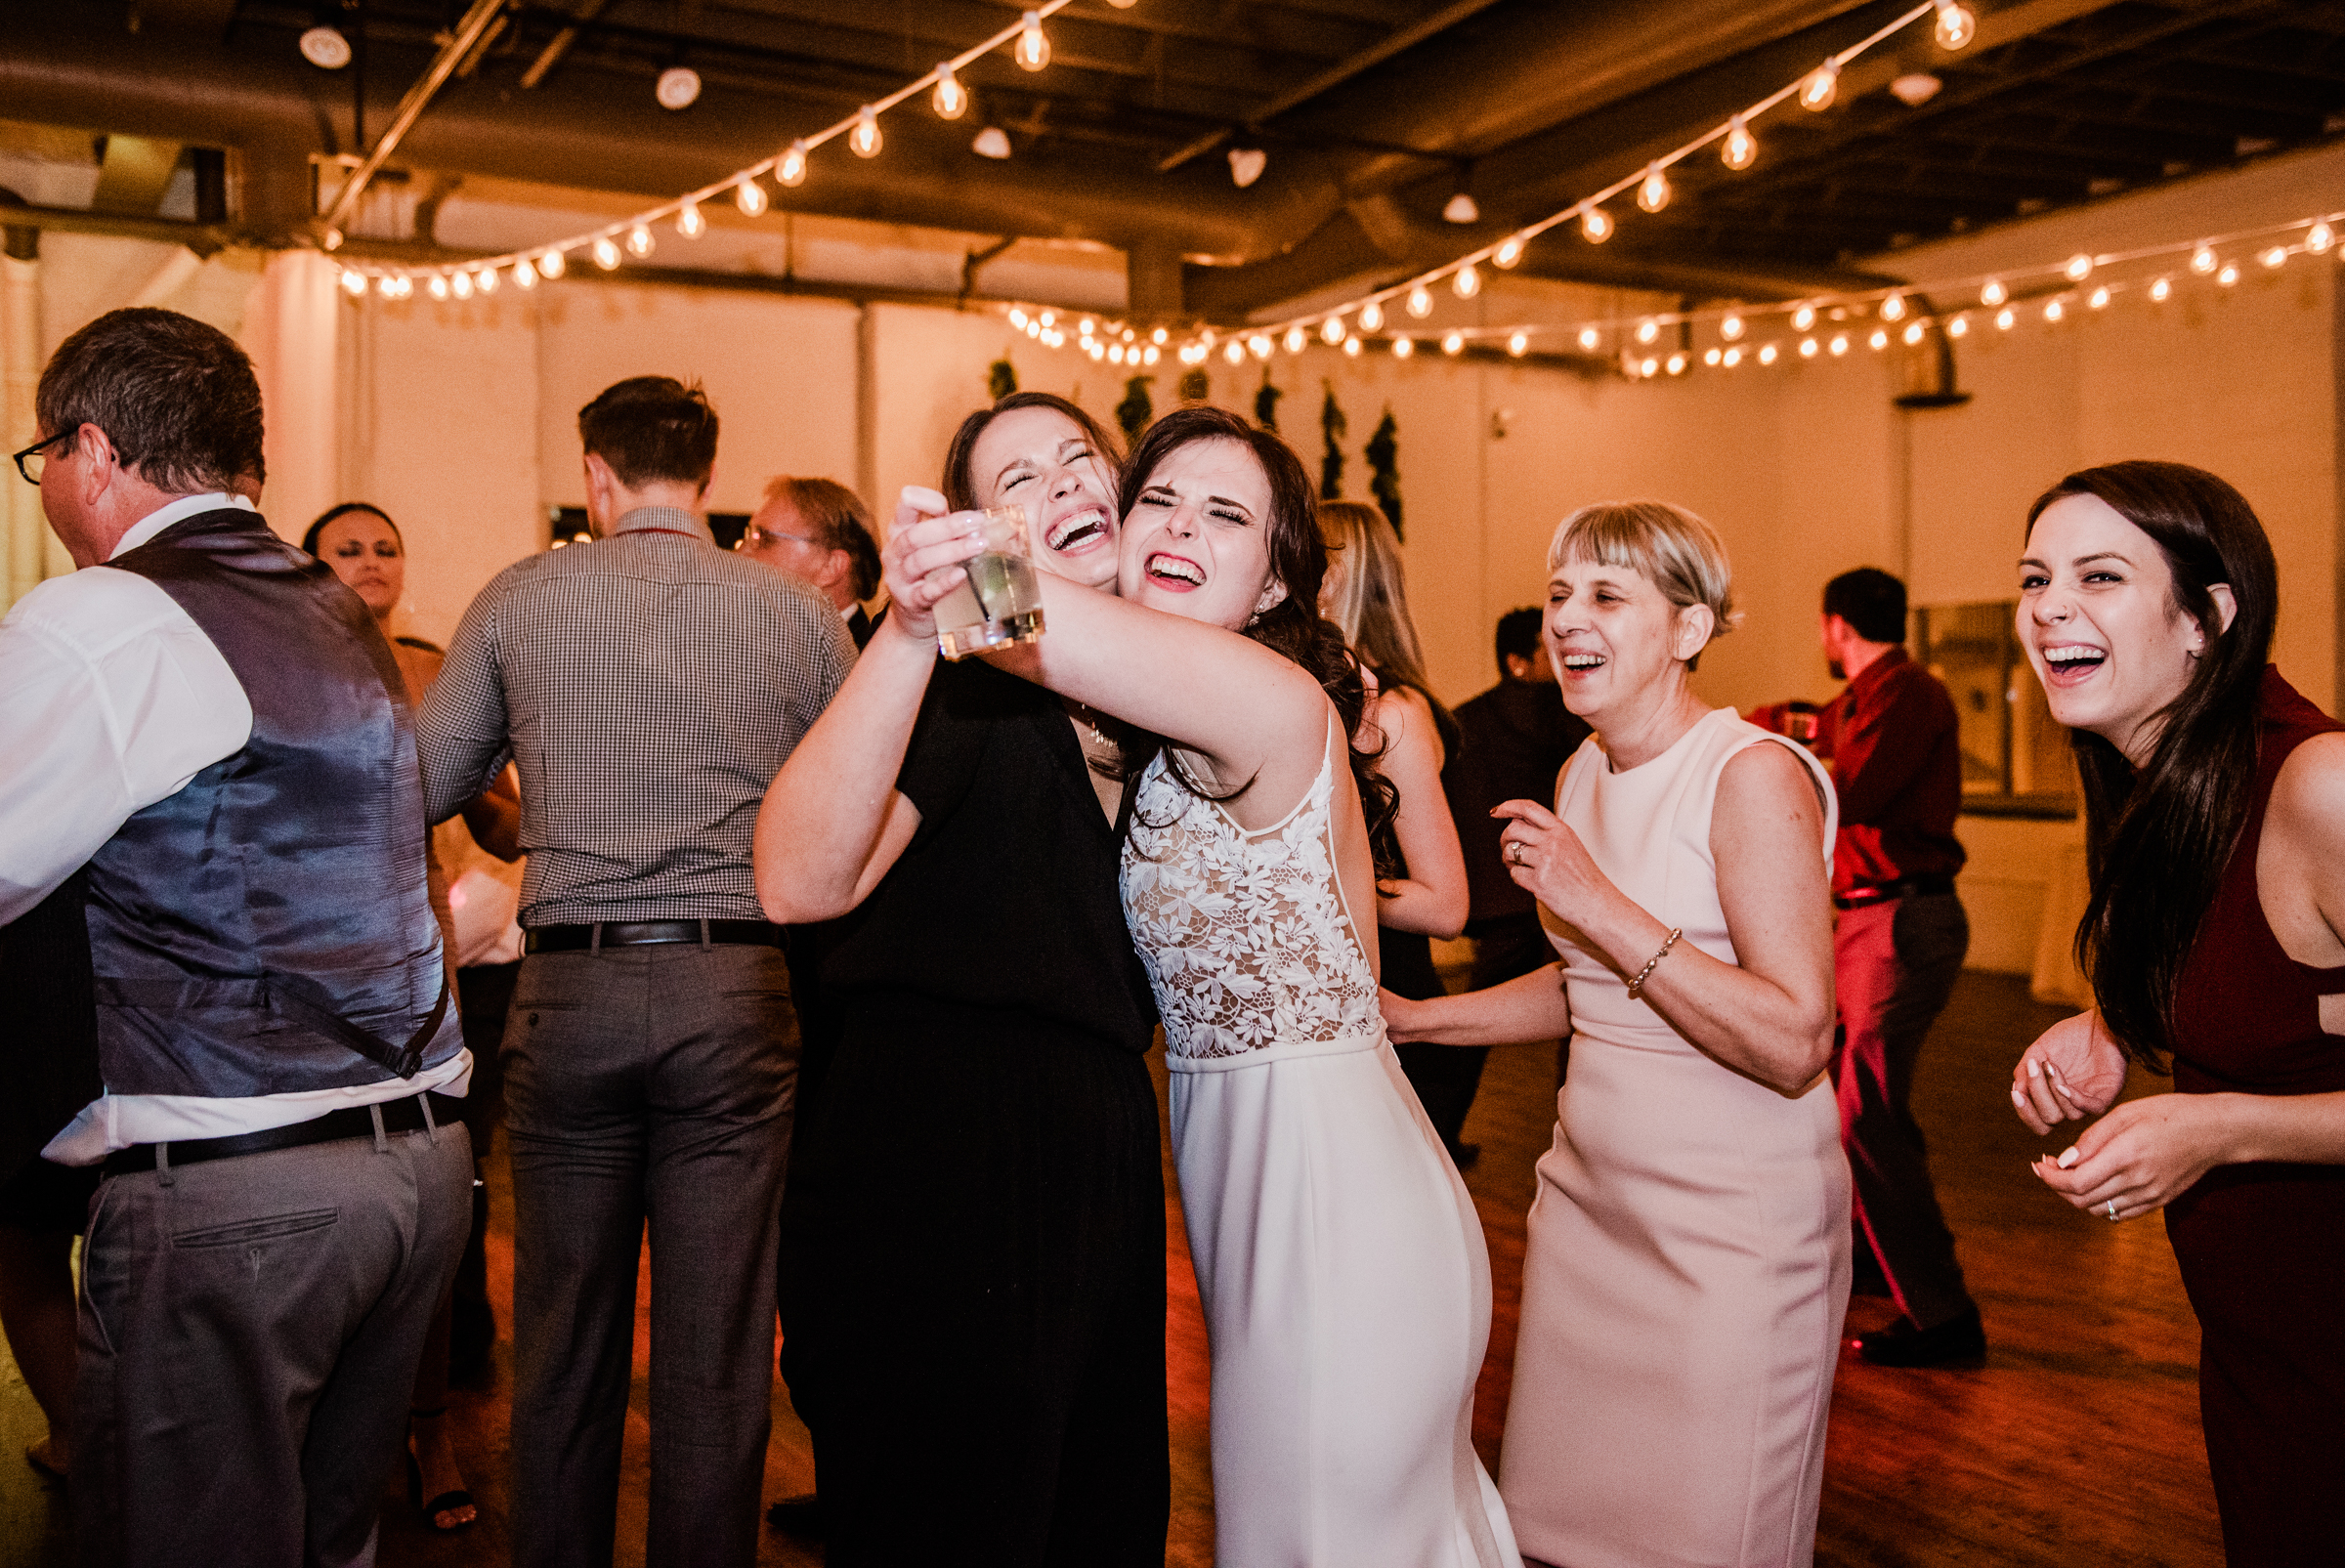 The_Arbor_LoftRochester_Wedding_JILL_STUDIO_Rochester_NY_Photographer_203716.jpg